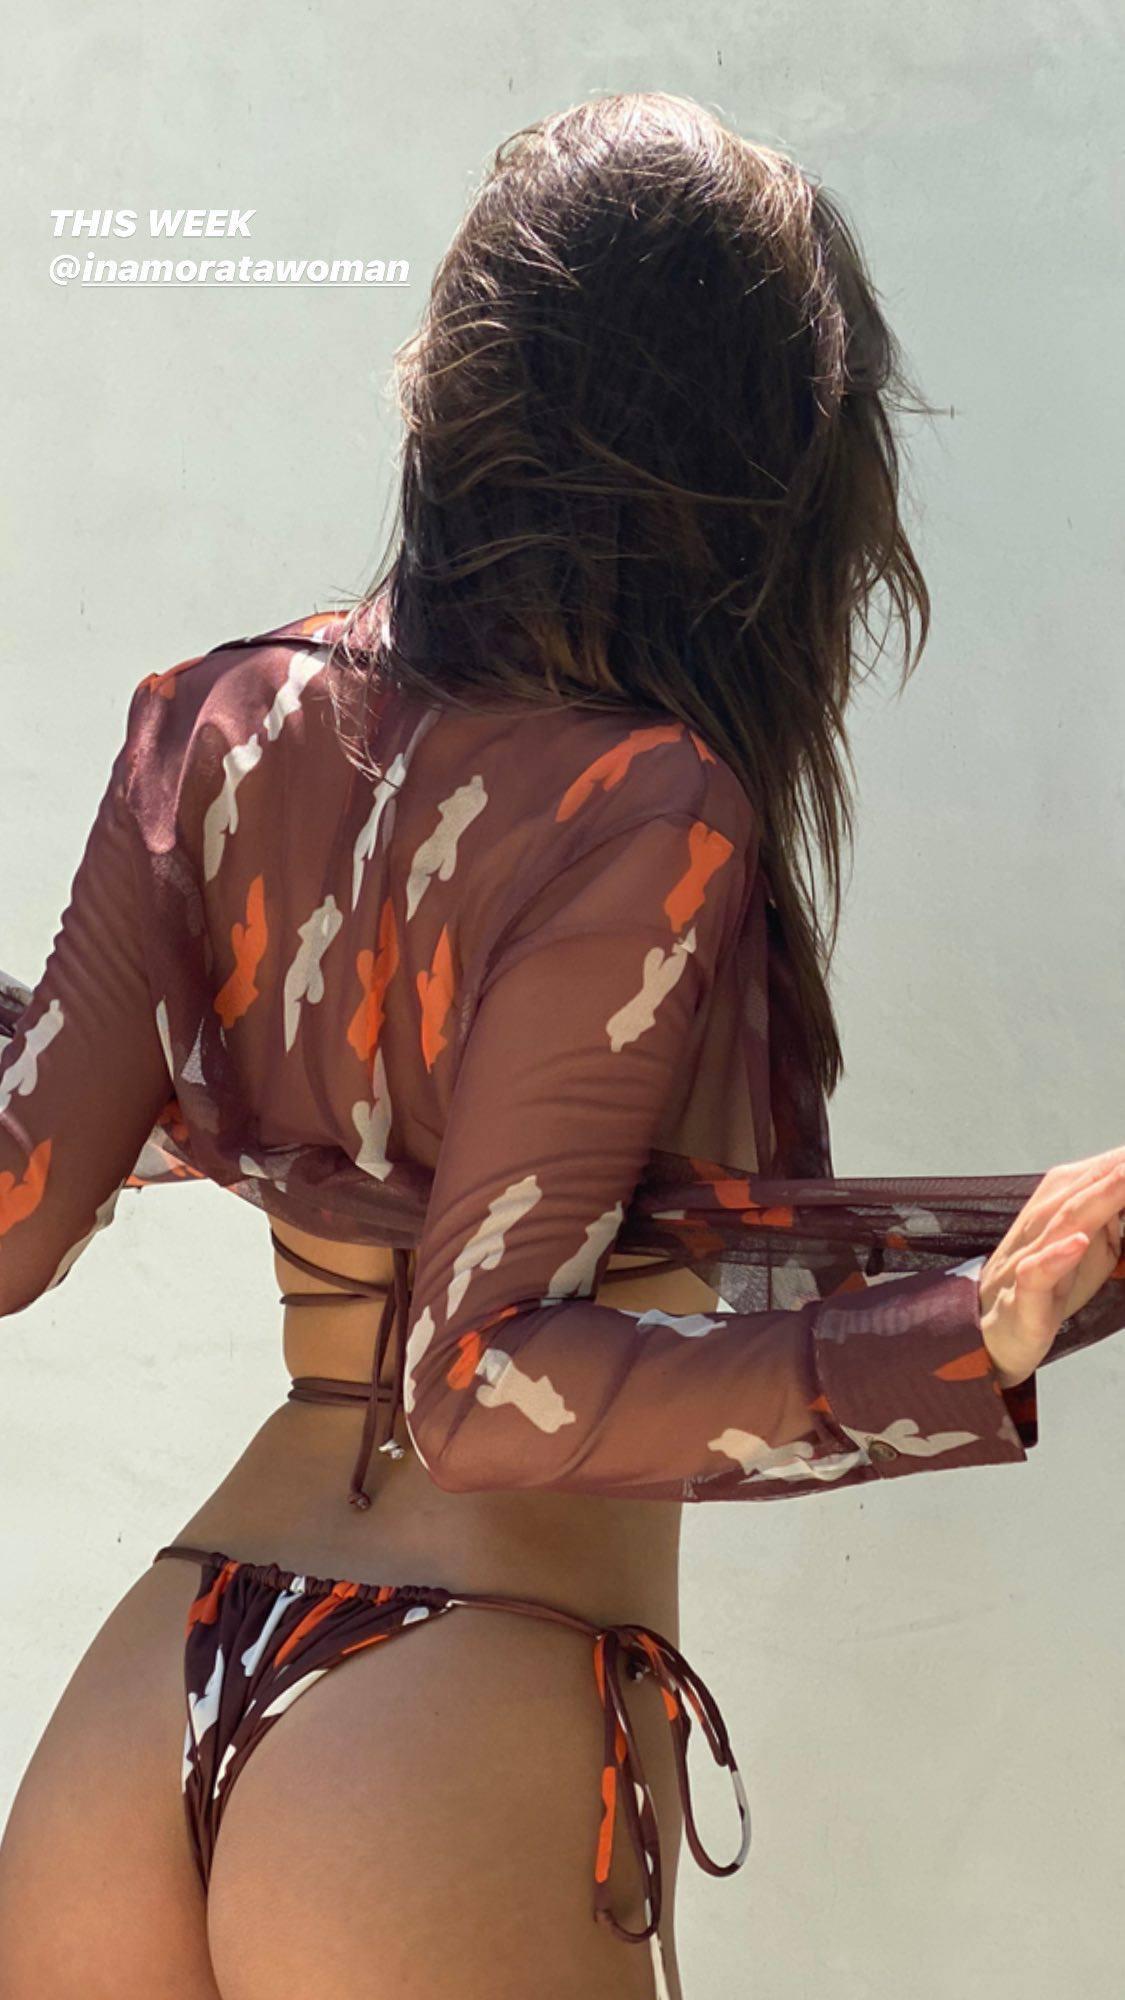 Emily Ratajkowski – Beautiful Ass And Braless Boobs In Sexy Inamorata Photoshoot 0003